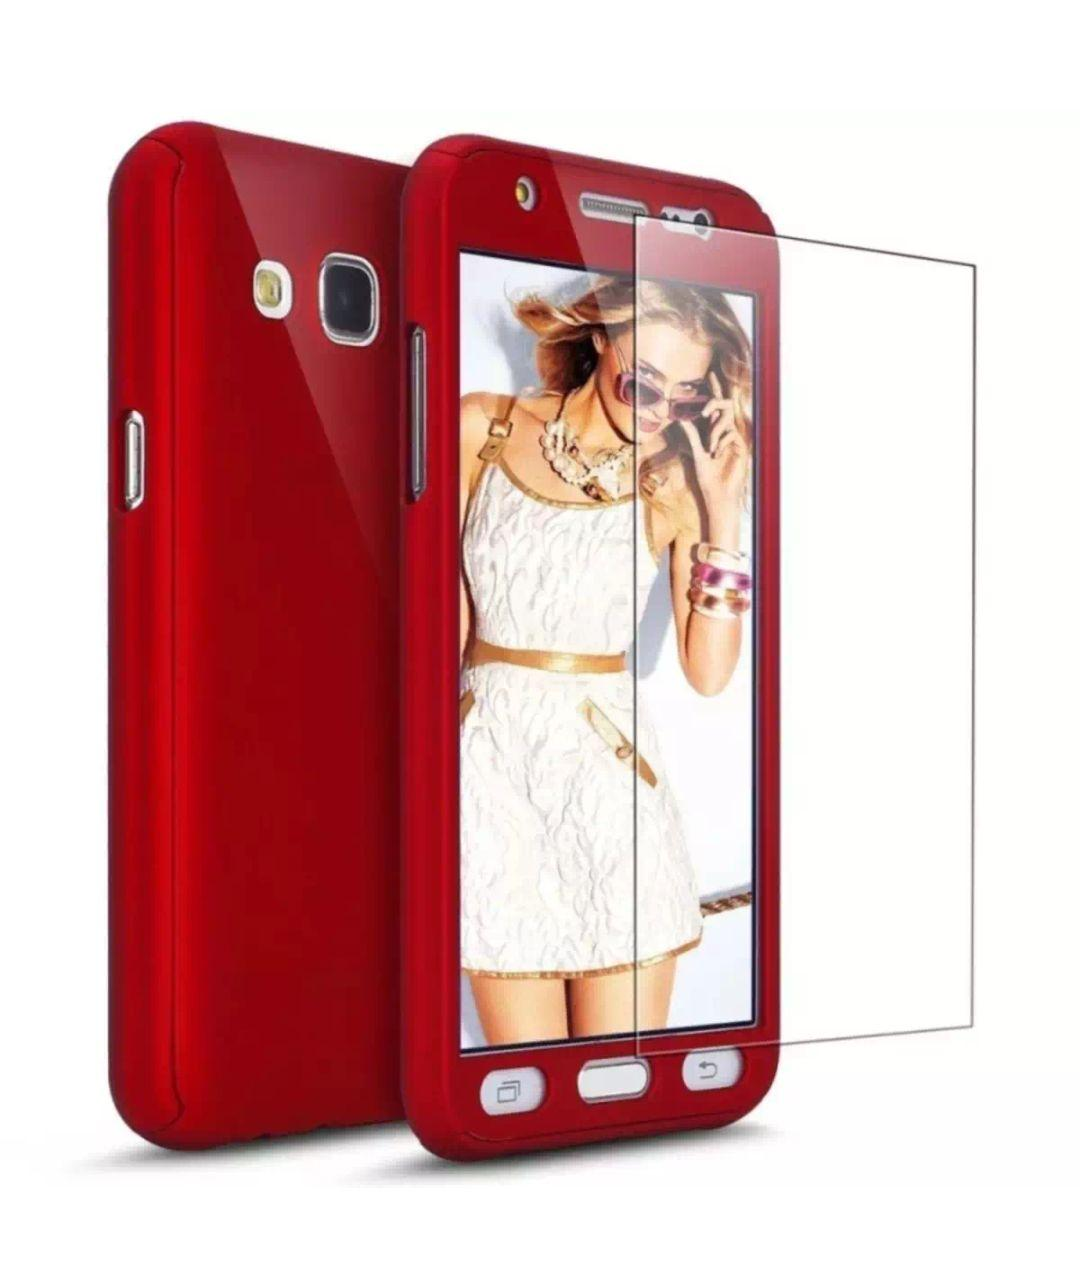 Full HardCase Case IPAKY 360 For Samsung Galaxy J1 ACE